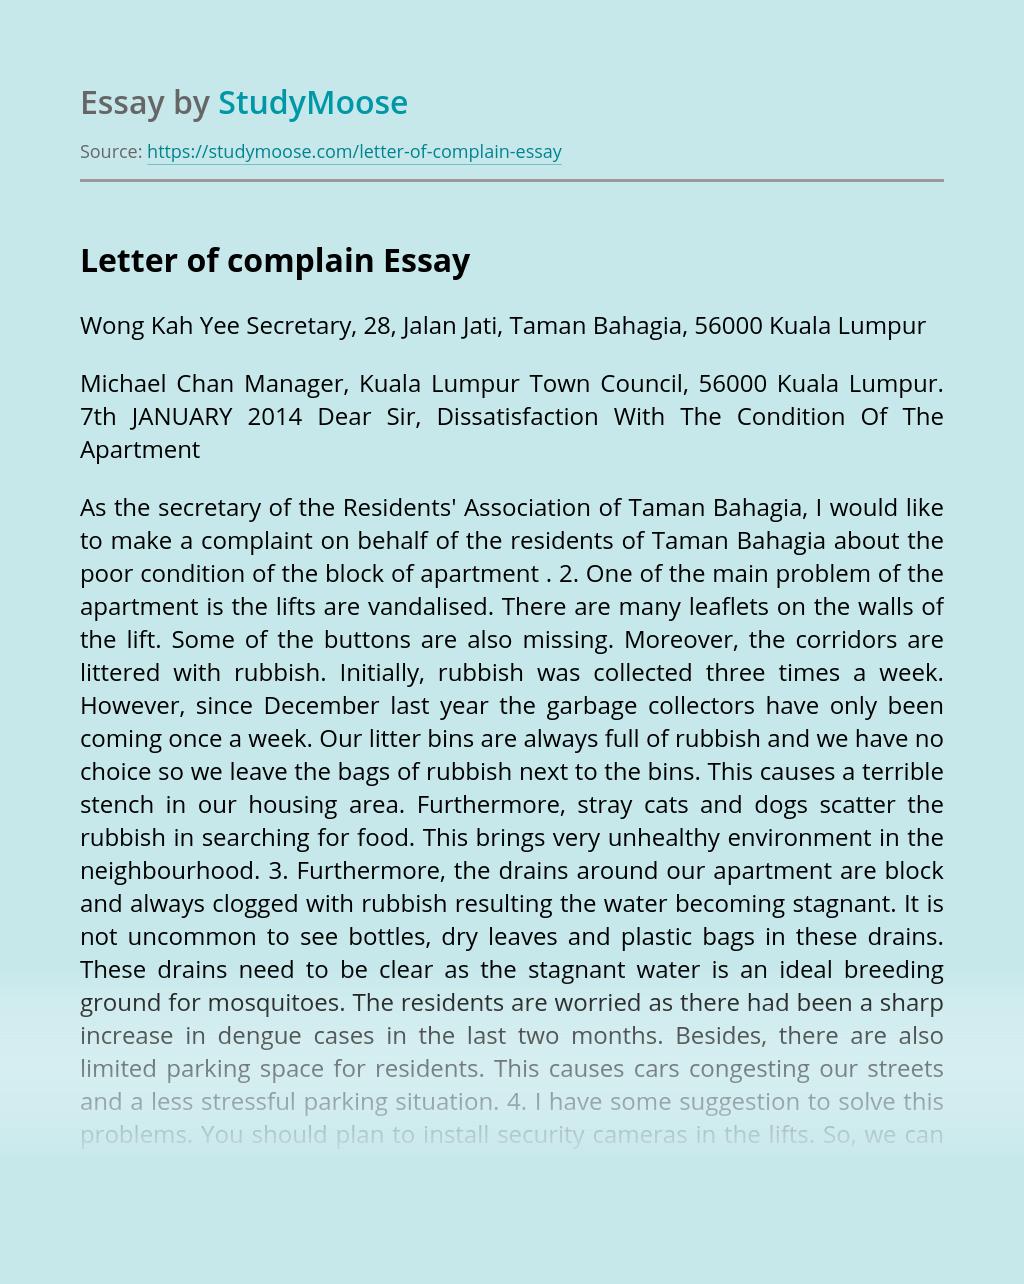 Letter of complain